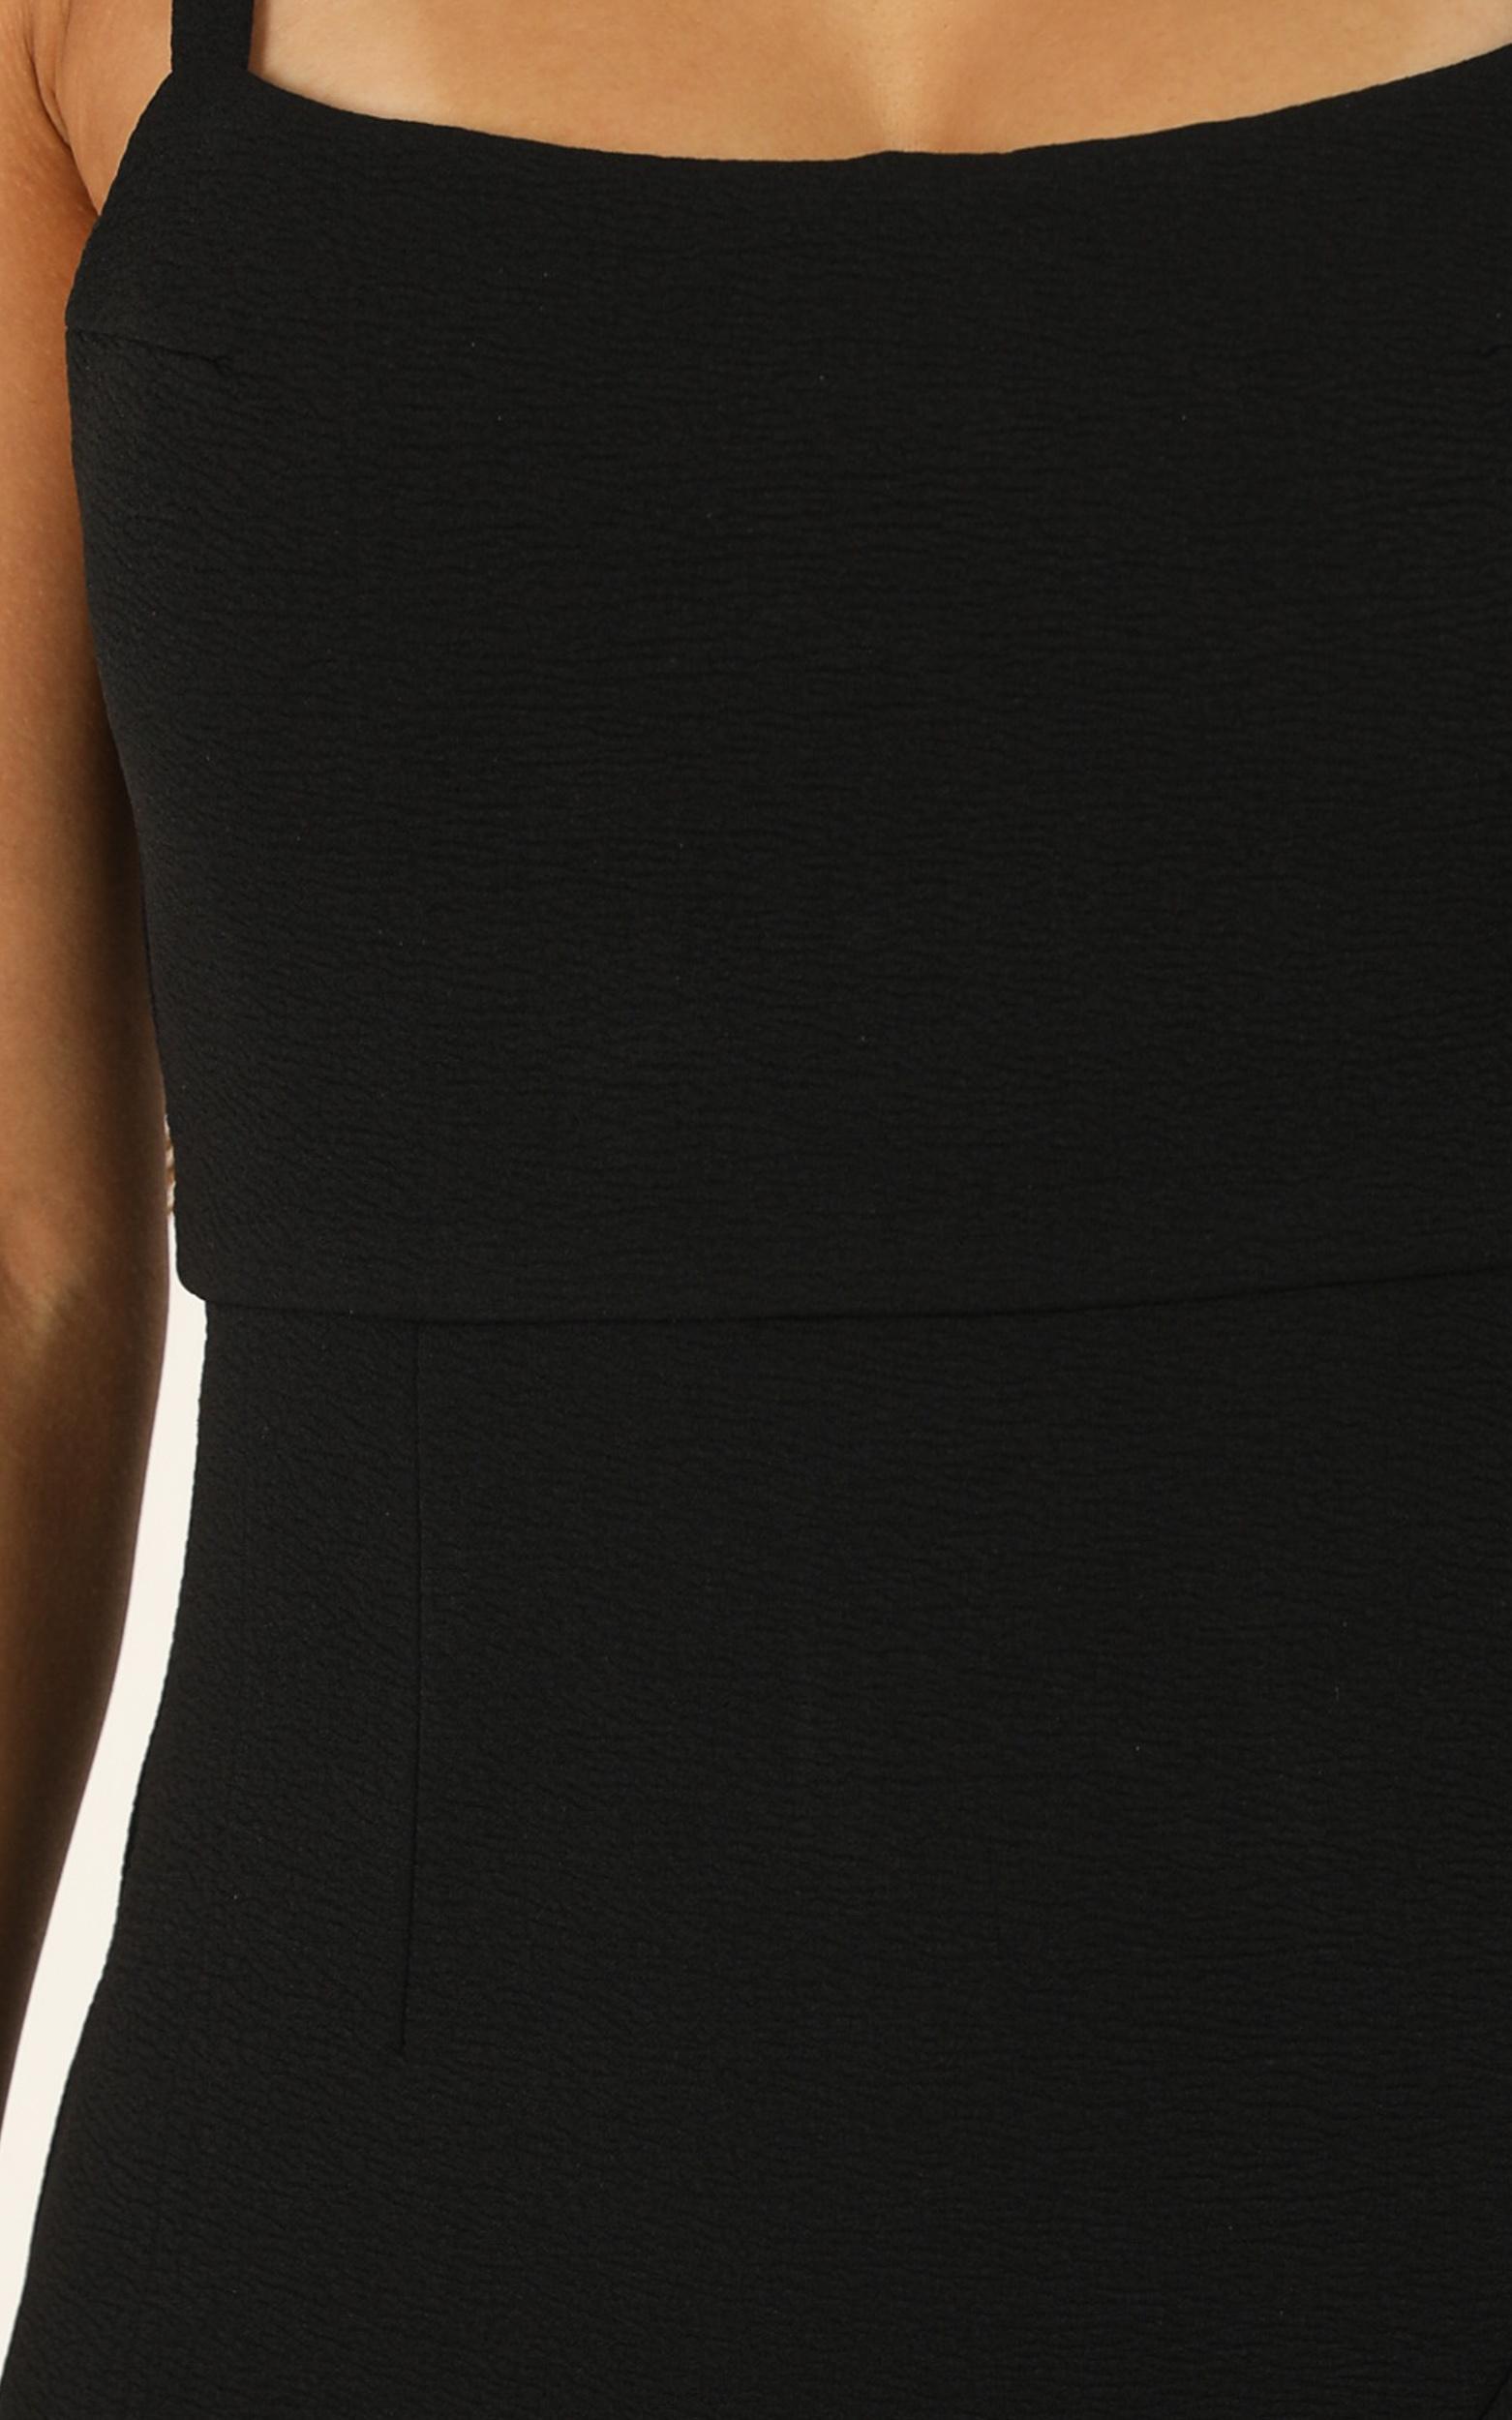 Change Your Thoughts dress in black - 12 (L), Black, hi-res image number null